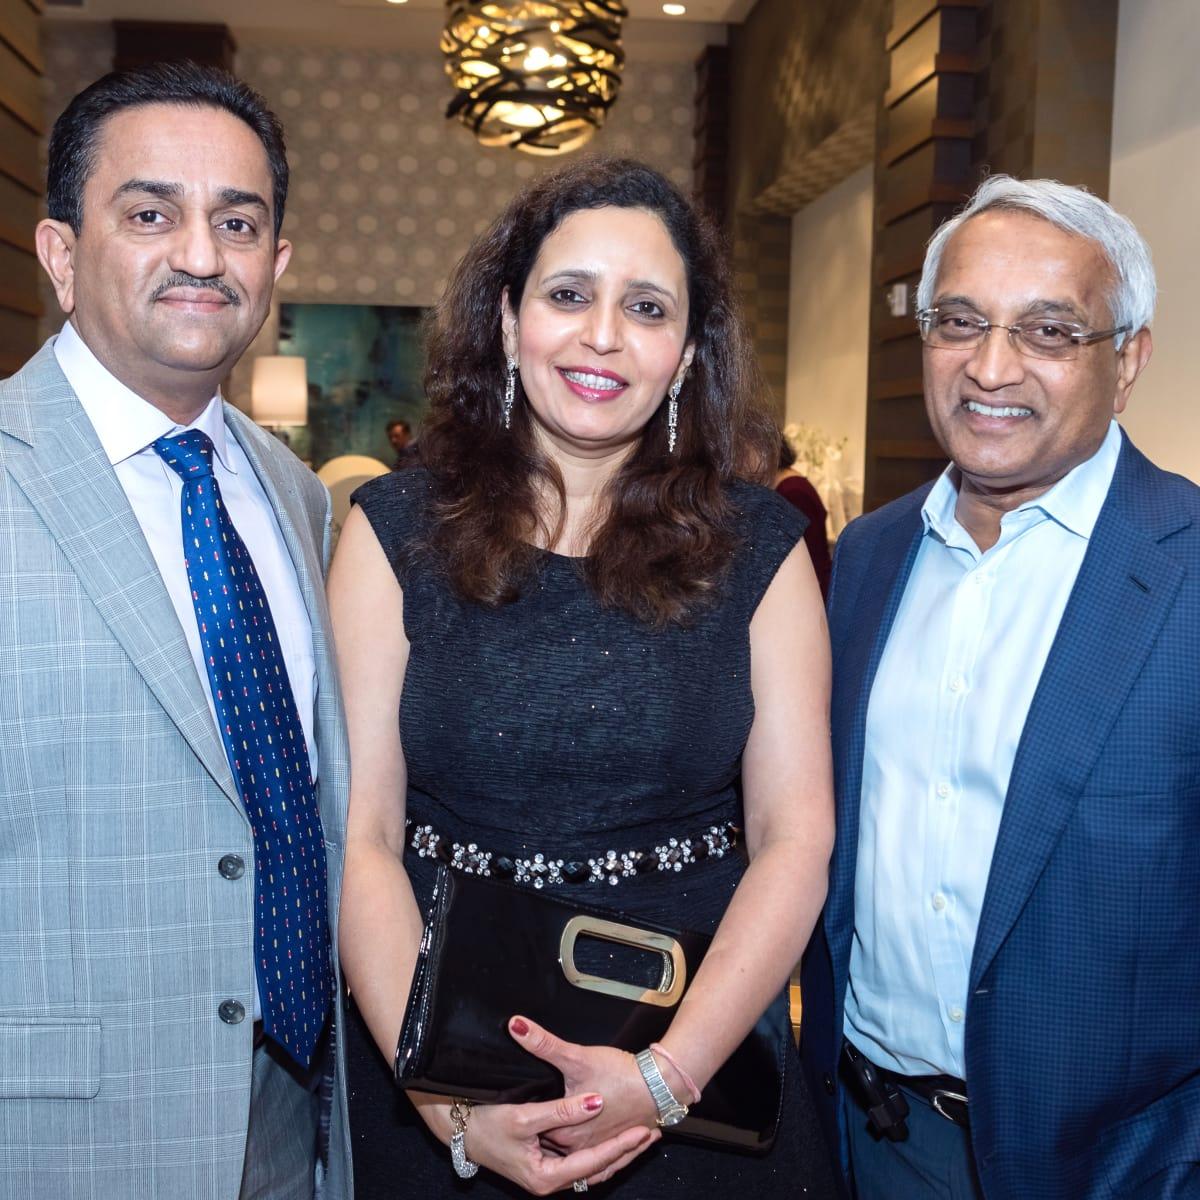 Houston, Pratham Houston's gala kickoff, March 2017, Pankaj Dhume, Asha Dhume, Dr. Madaiah Revani